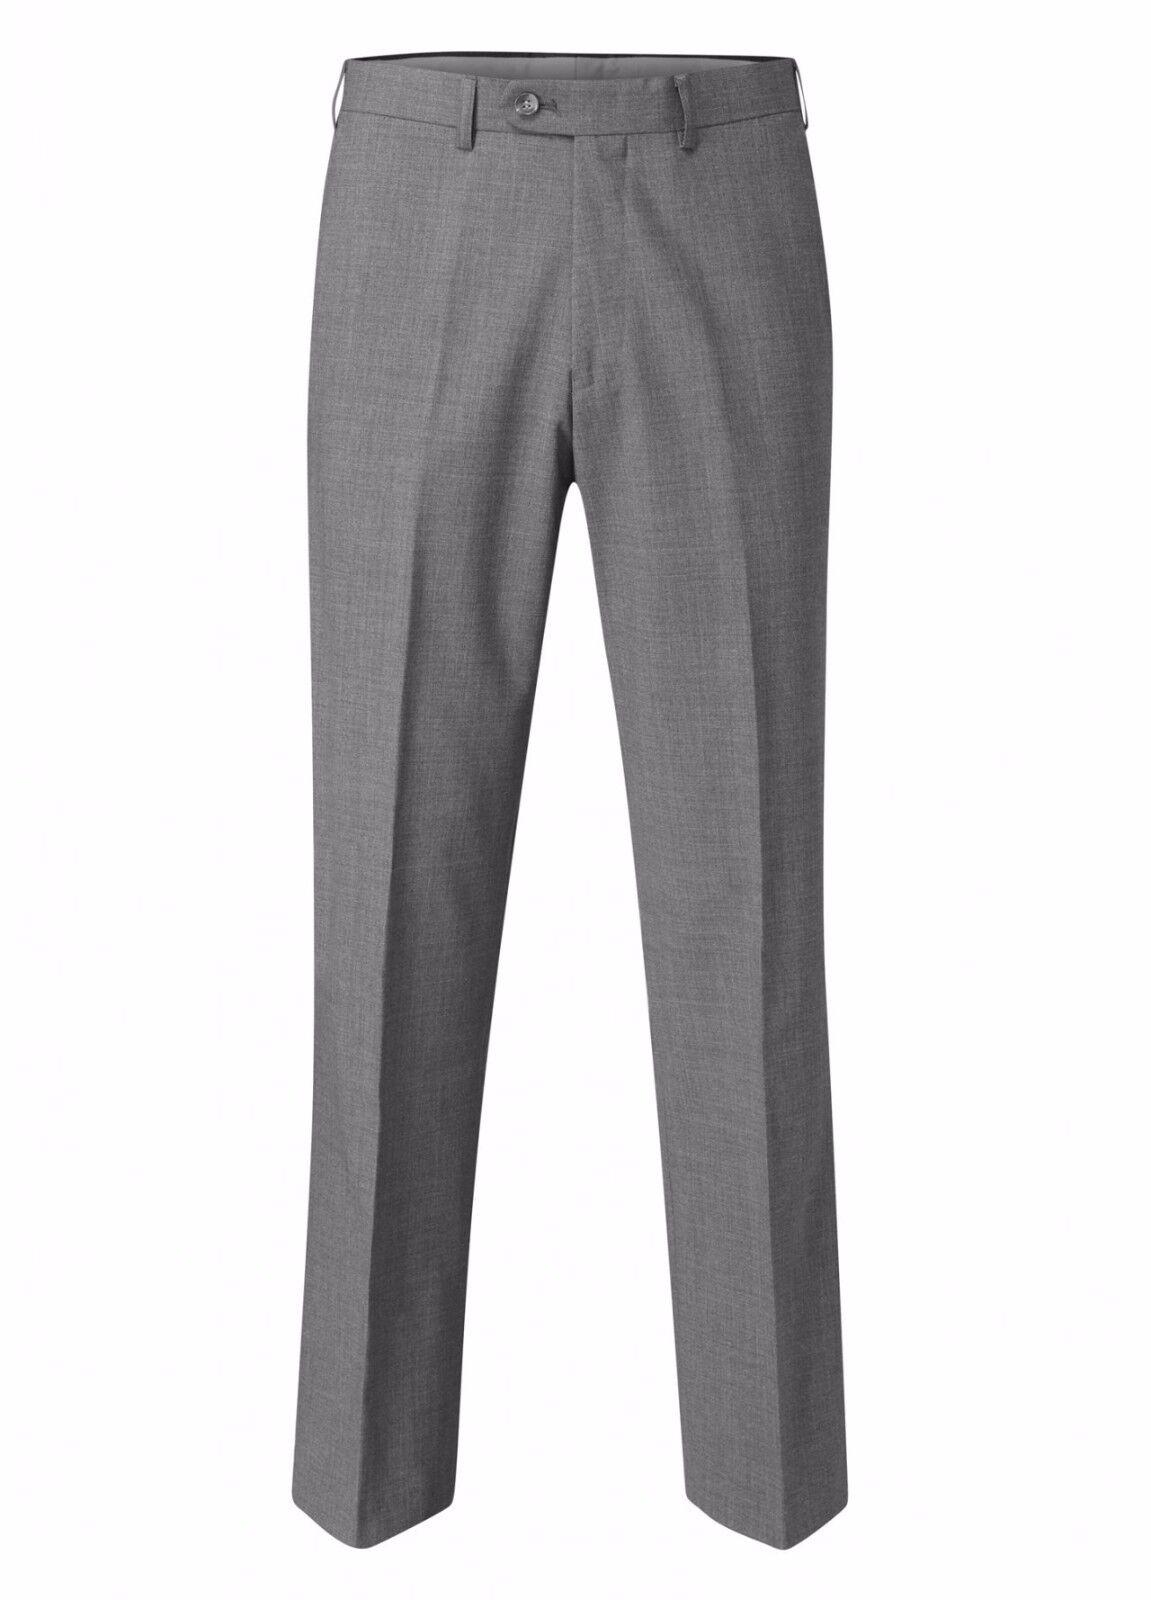 Scopes Darwin Grau Suit Trousers 56R TD172 BB 19